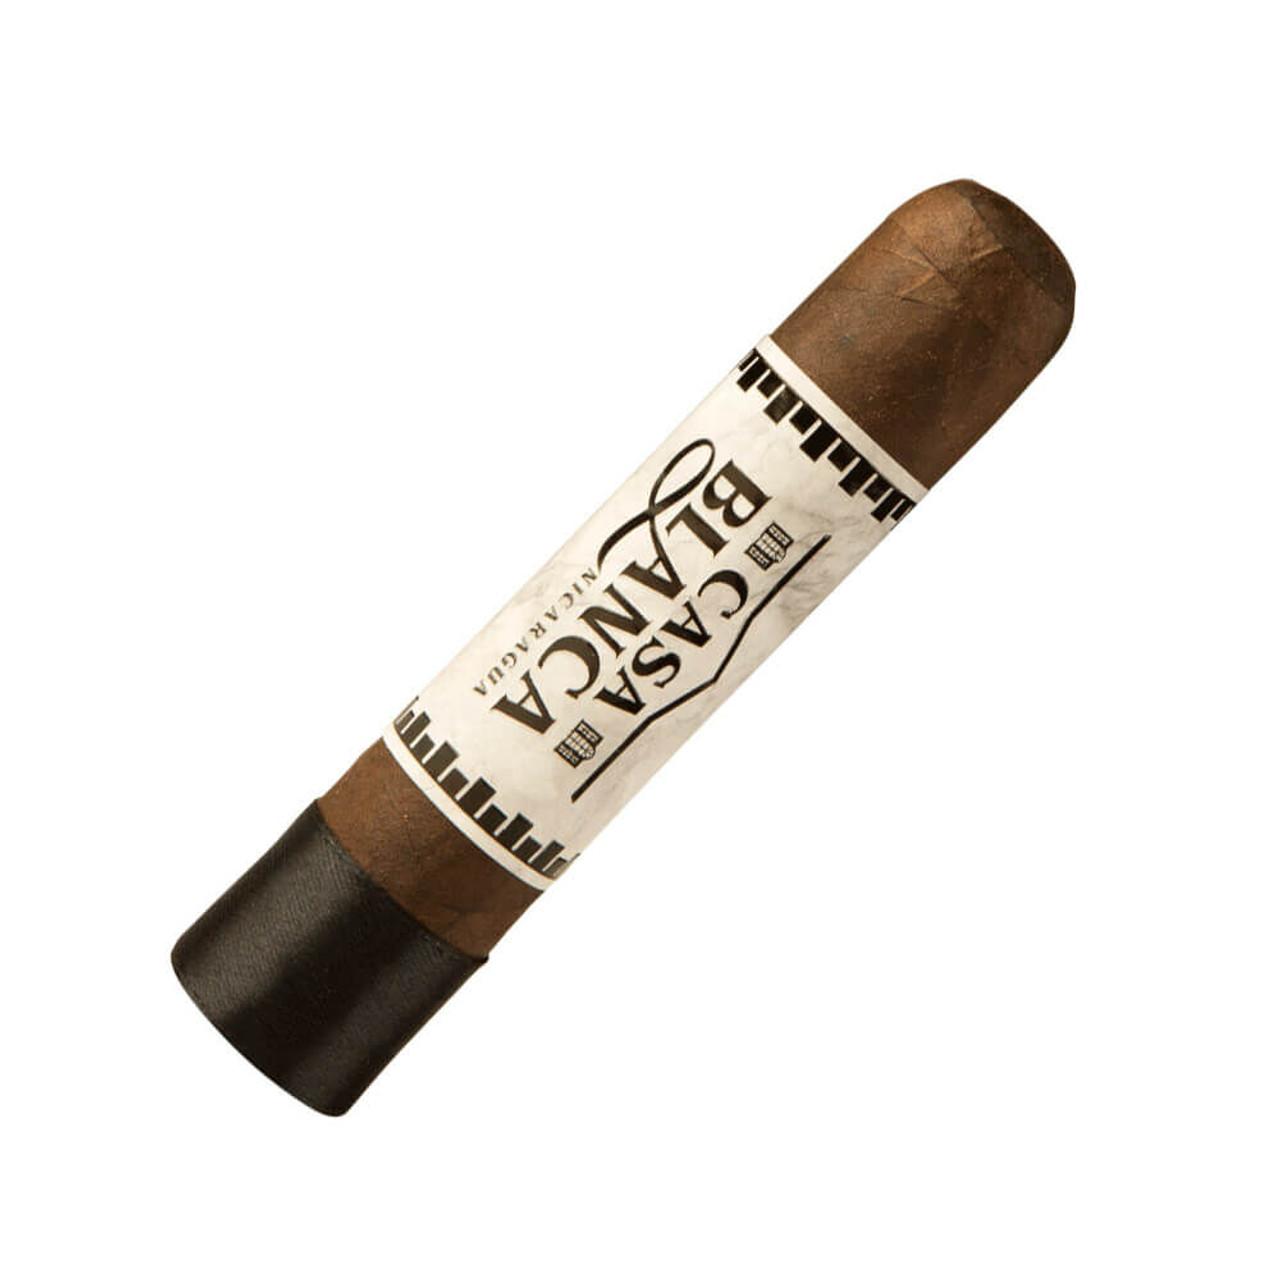 Casa Blanca Nicaragua Half Jeroboam Maduro Cigars - 5 x 66 (Box of 10)